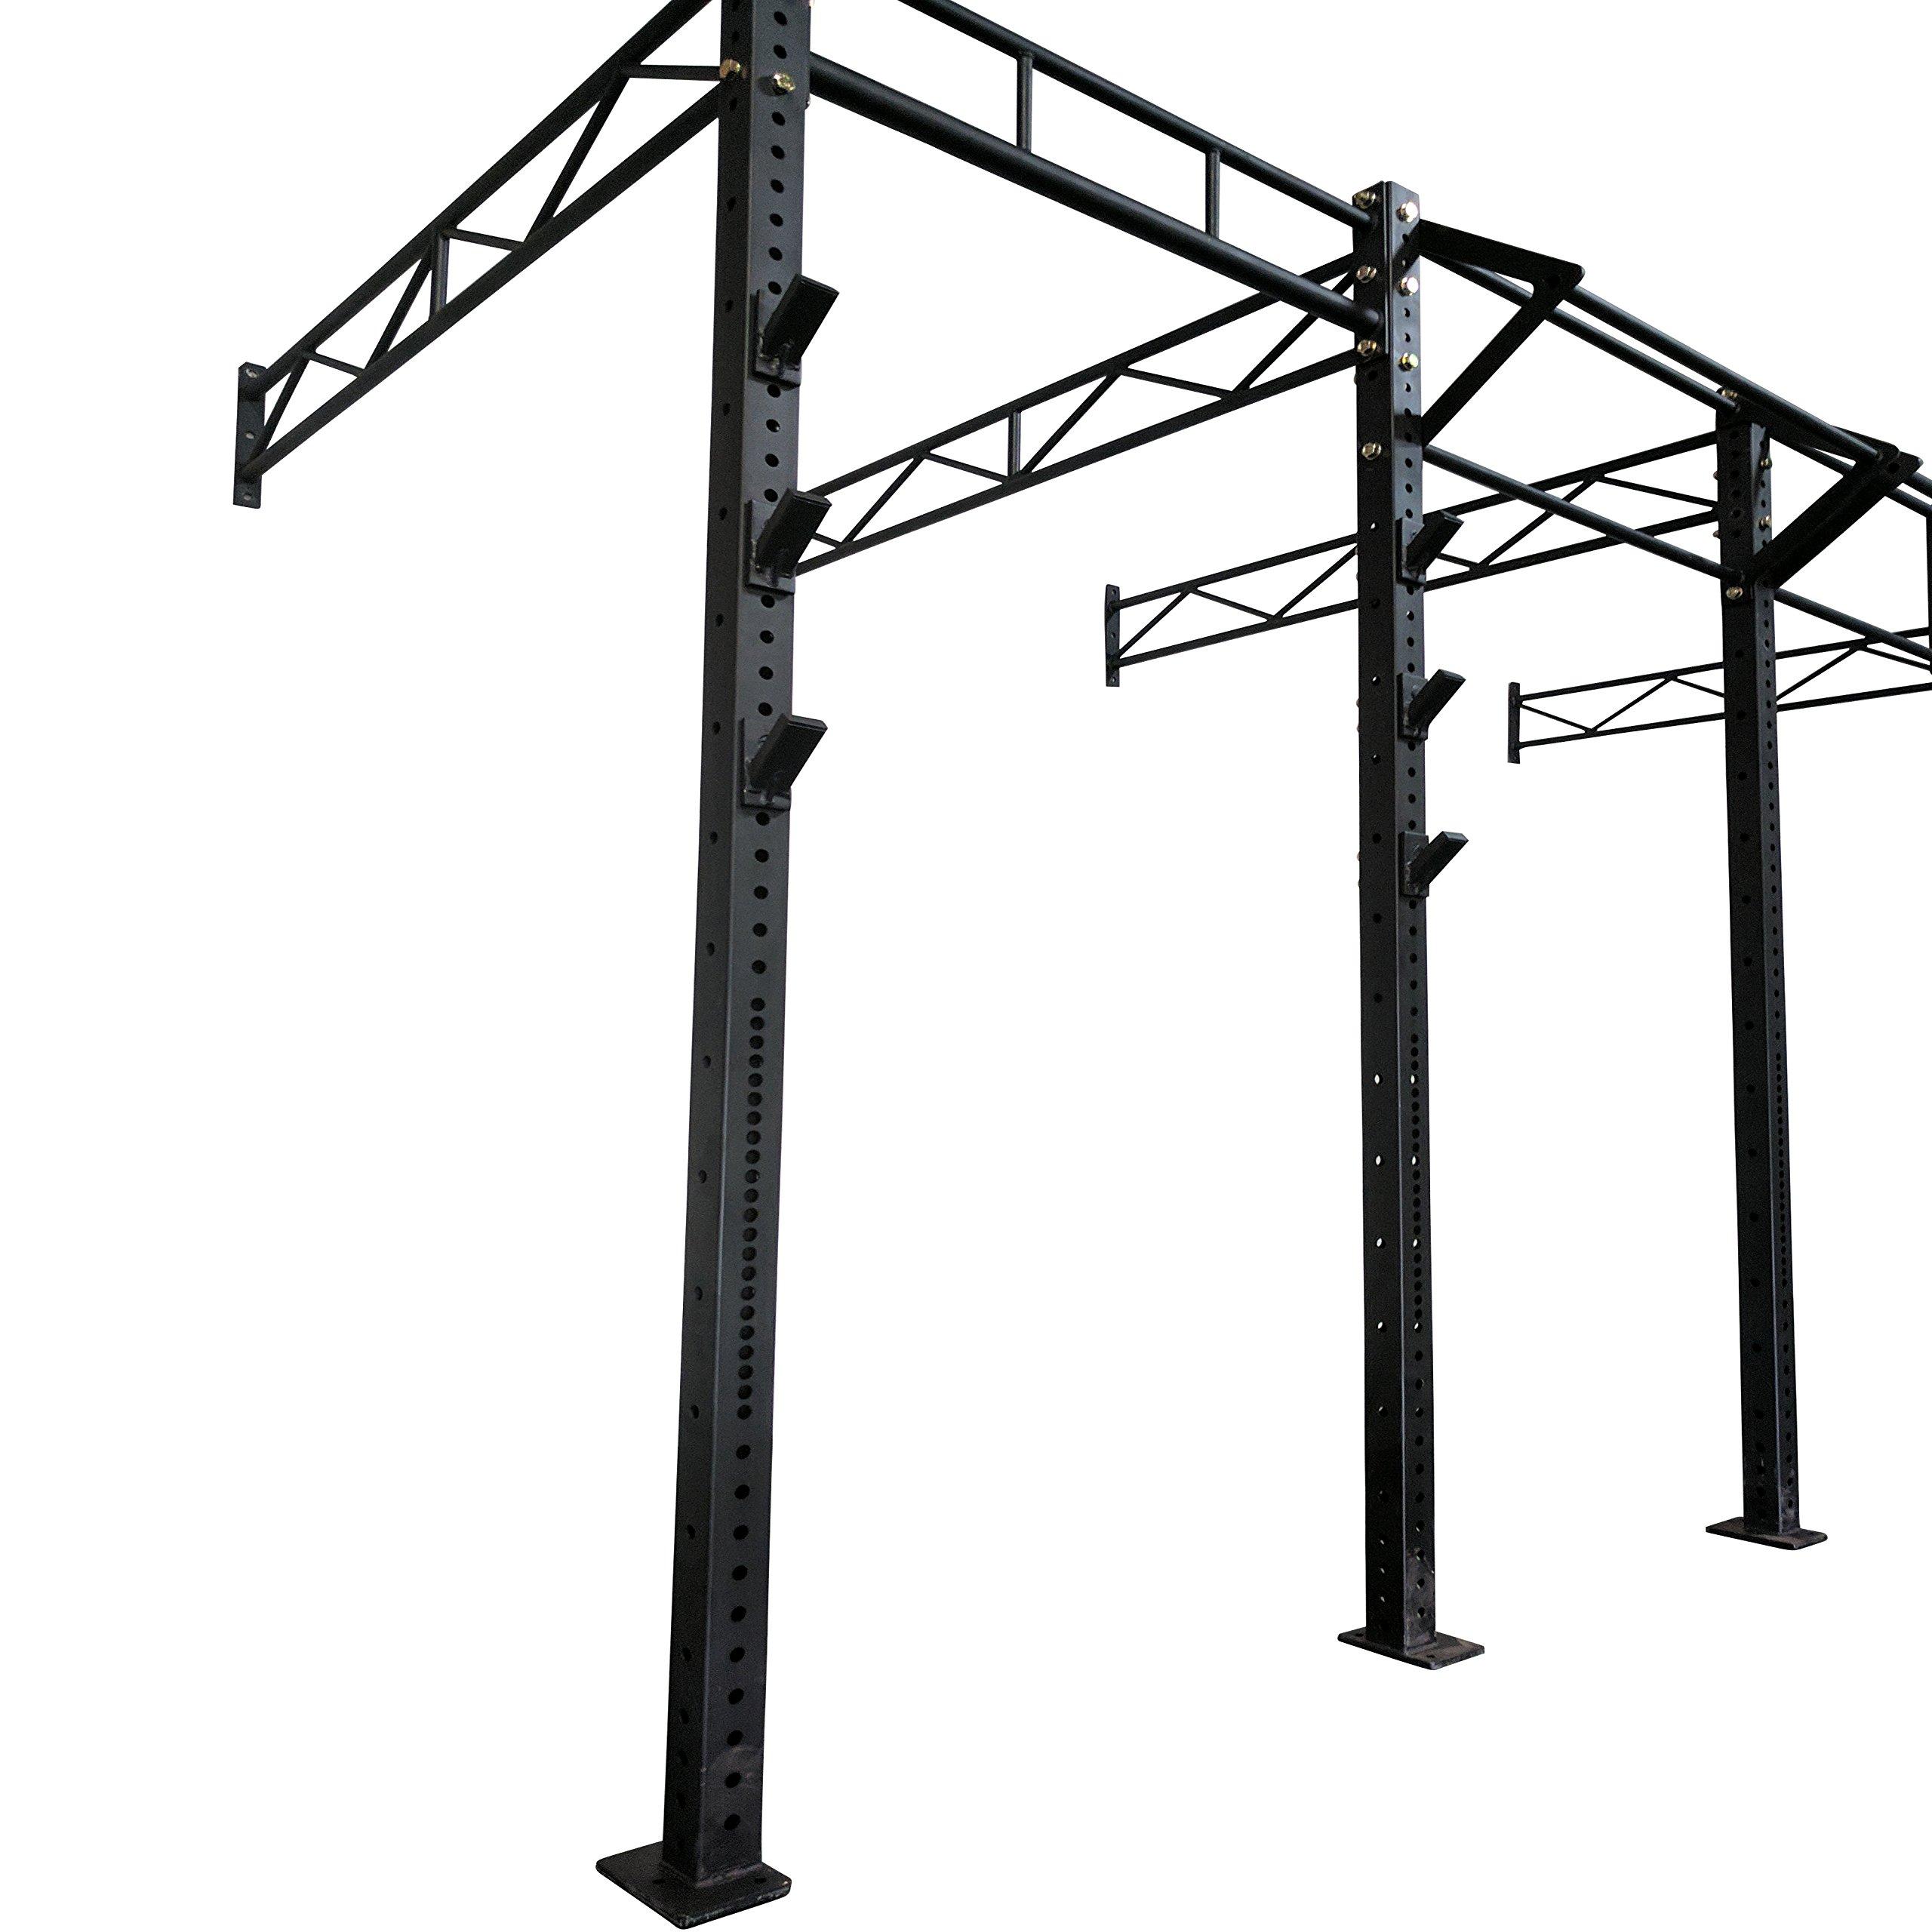 Set of (6) Titan Salmon Ladder Blocks